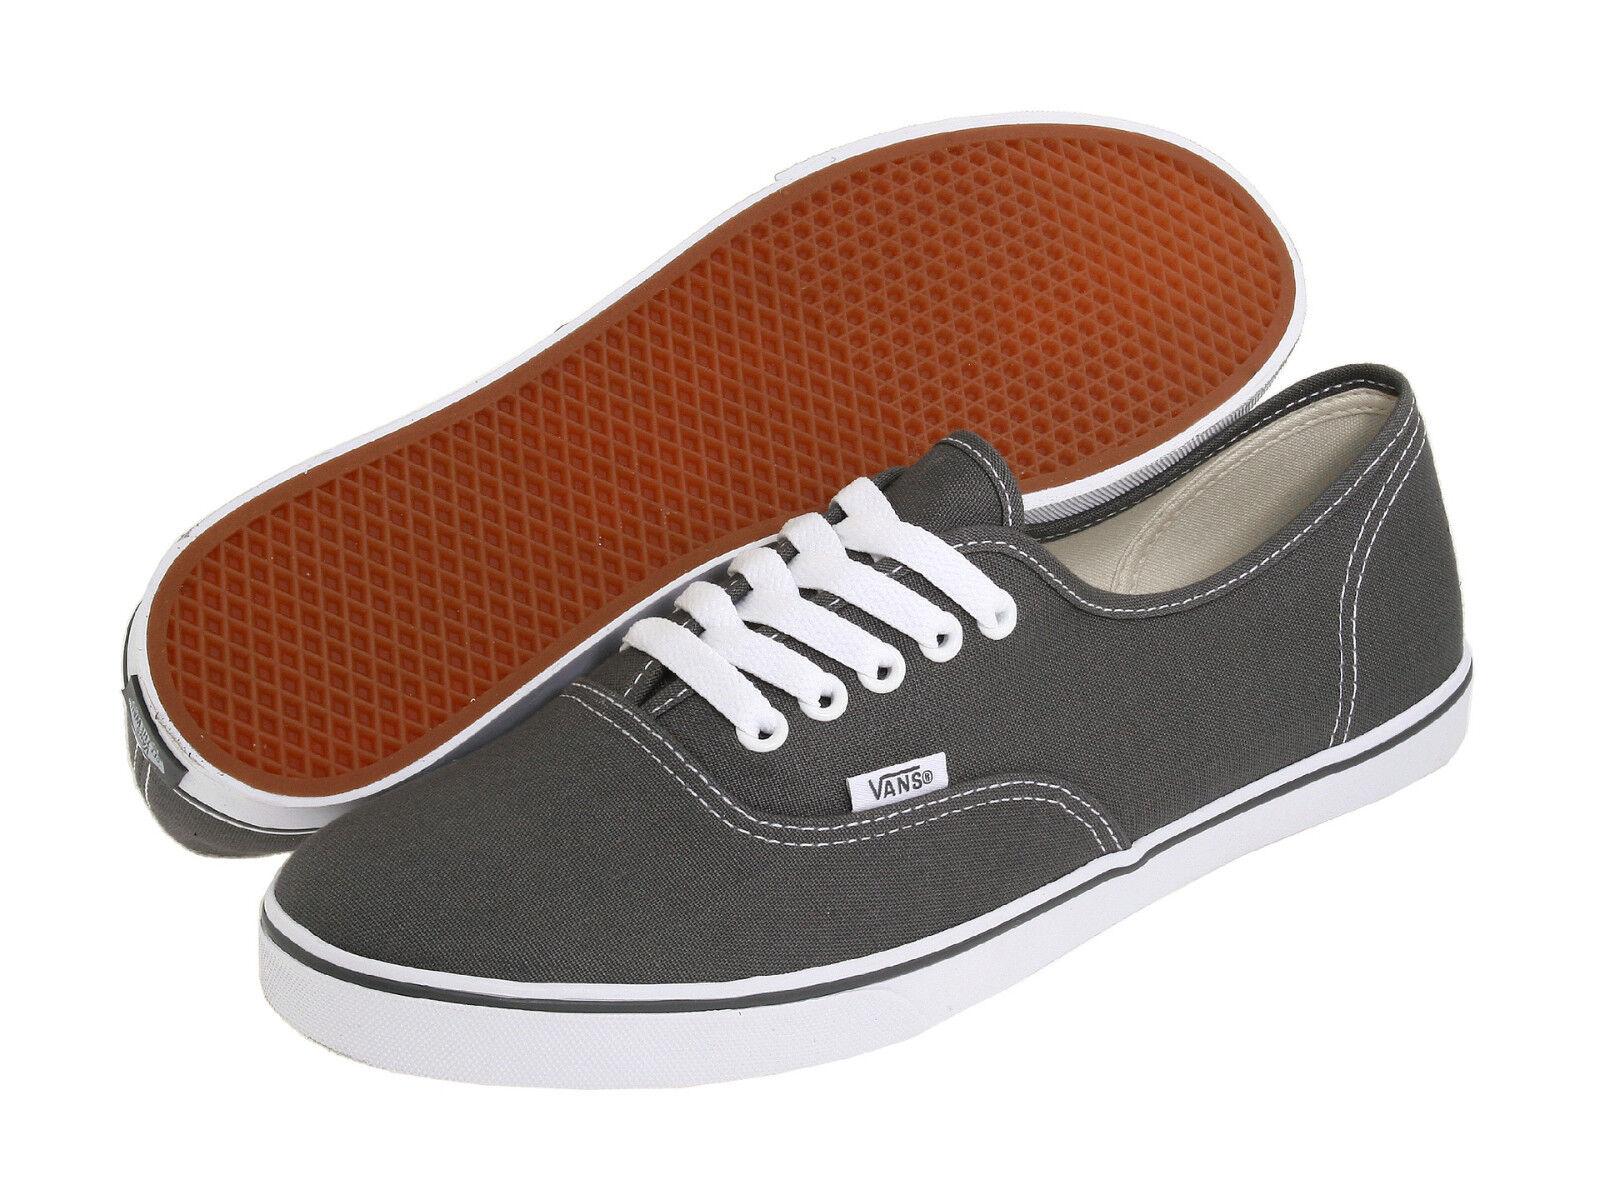 Vans AUTHENTIC LO PRO Mens Womens Pewter True White Canvas Lace Up Low Top shoes